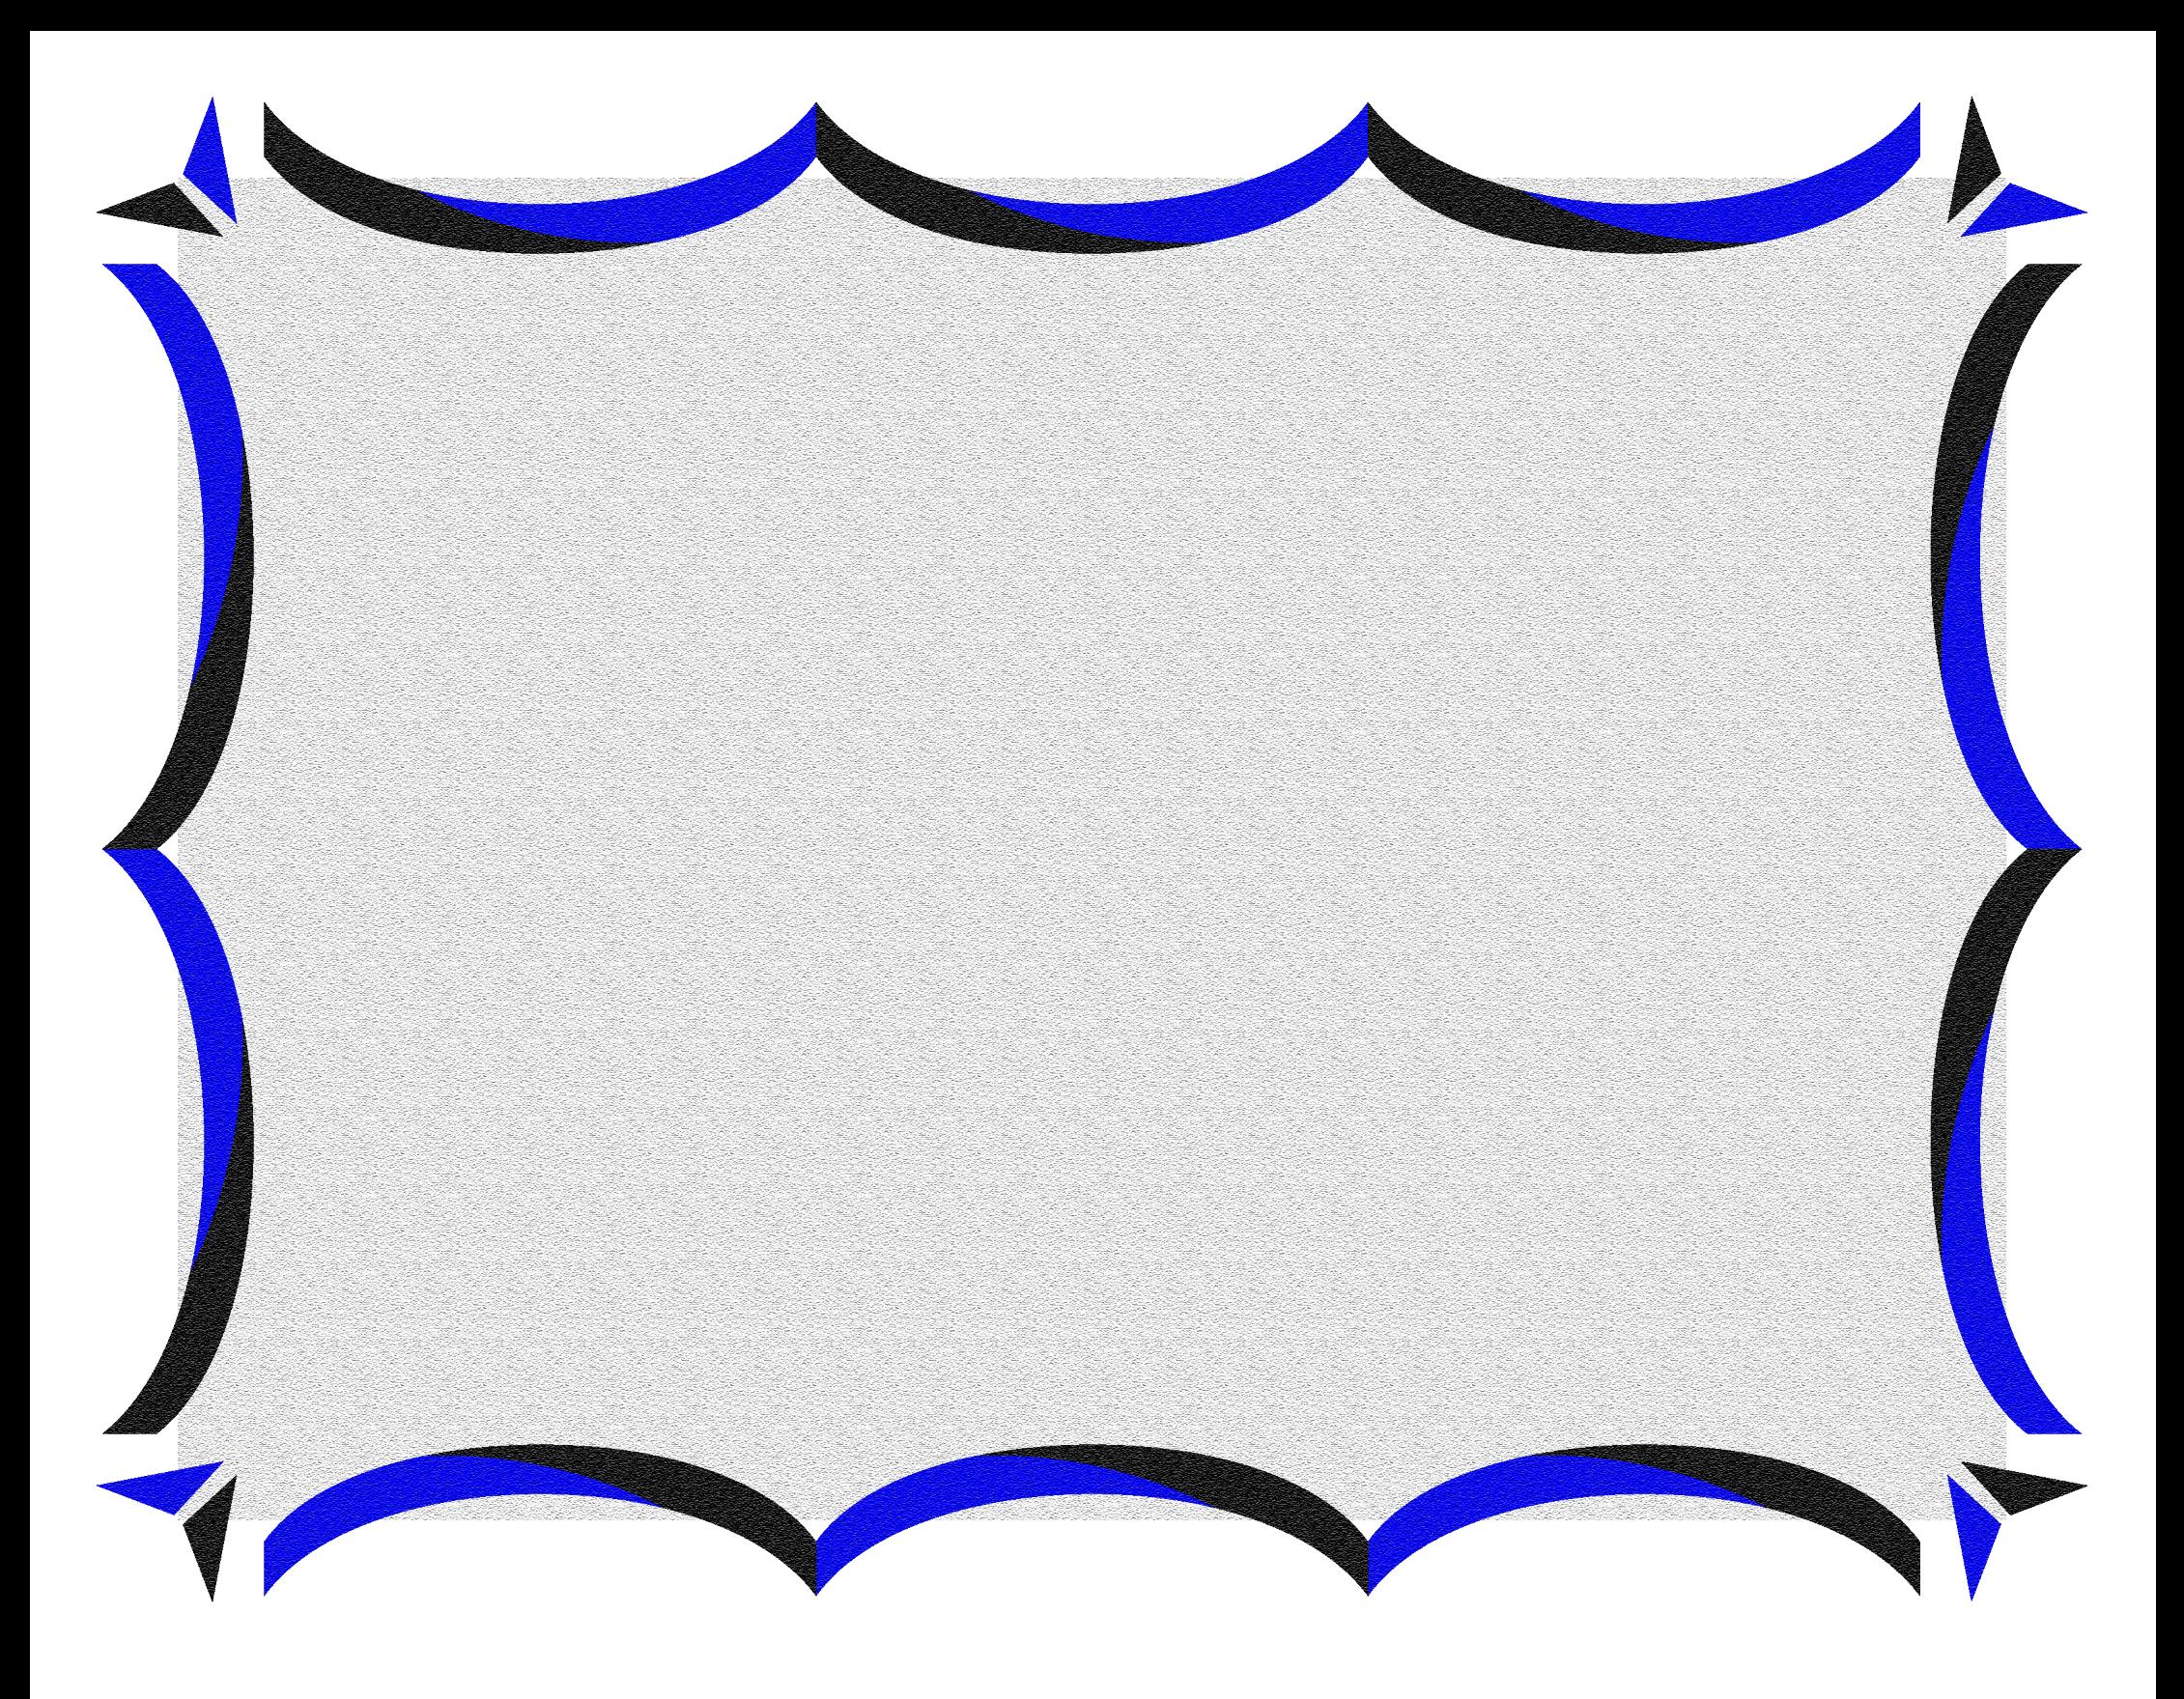 2261x1759 Word Certificate Borders Word Sign In Sheet Template  Certificate Borders For Word